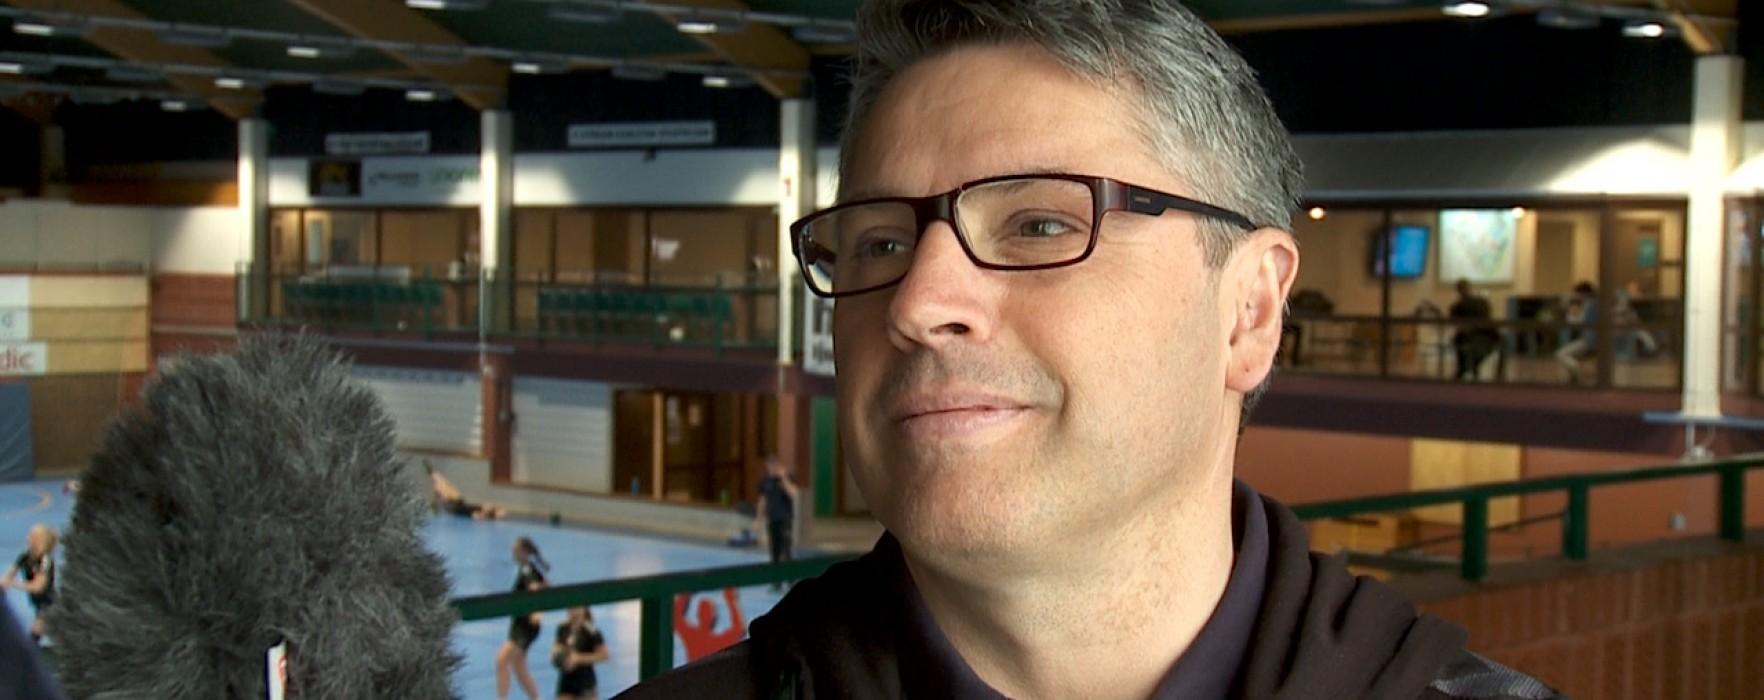 Glimt Sport – Helltons nye tränare